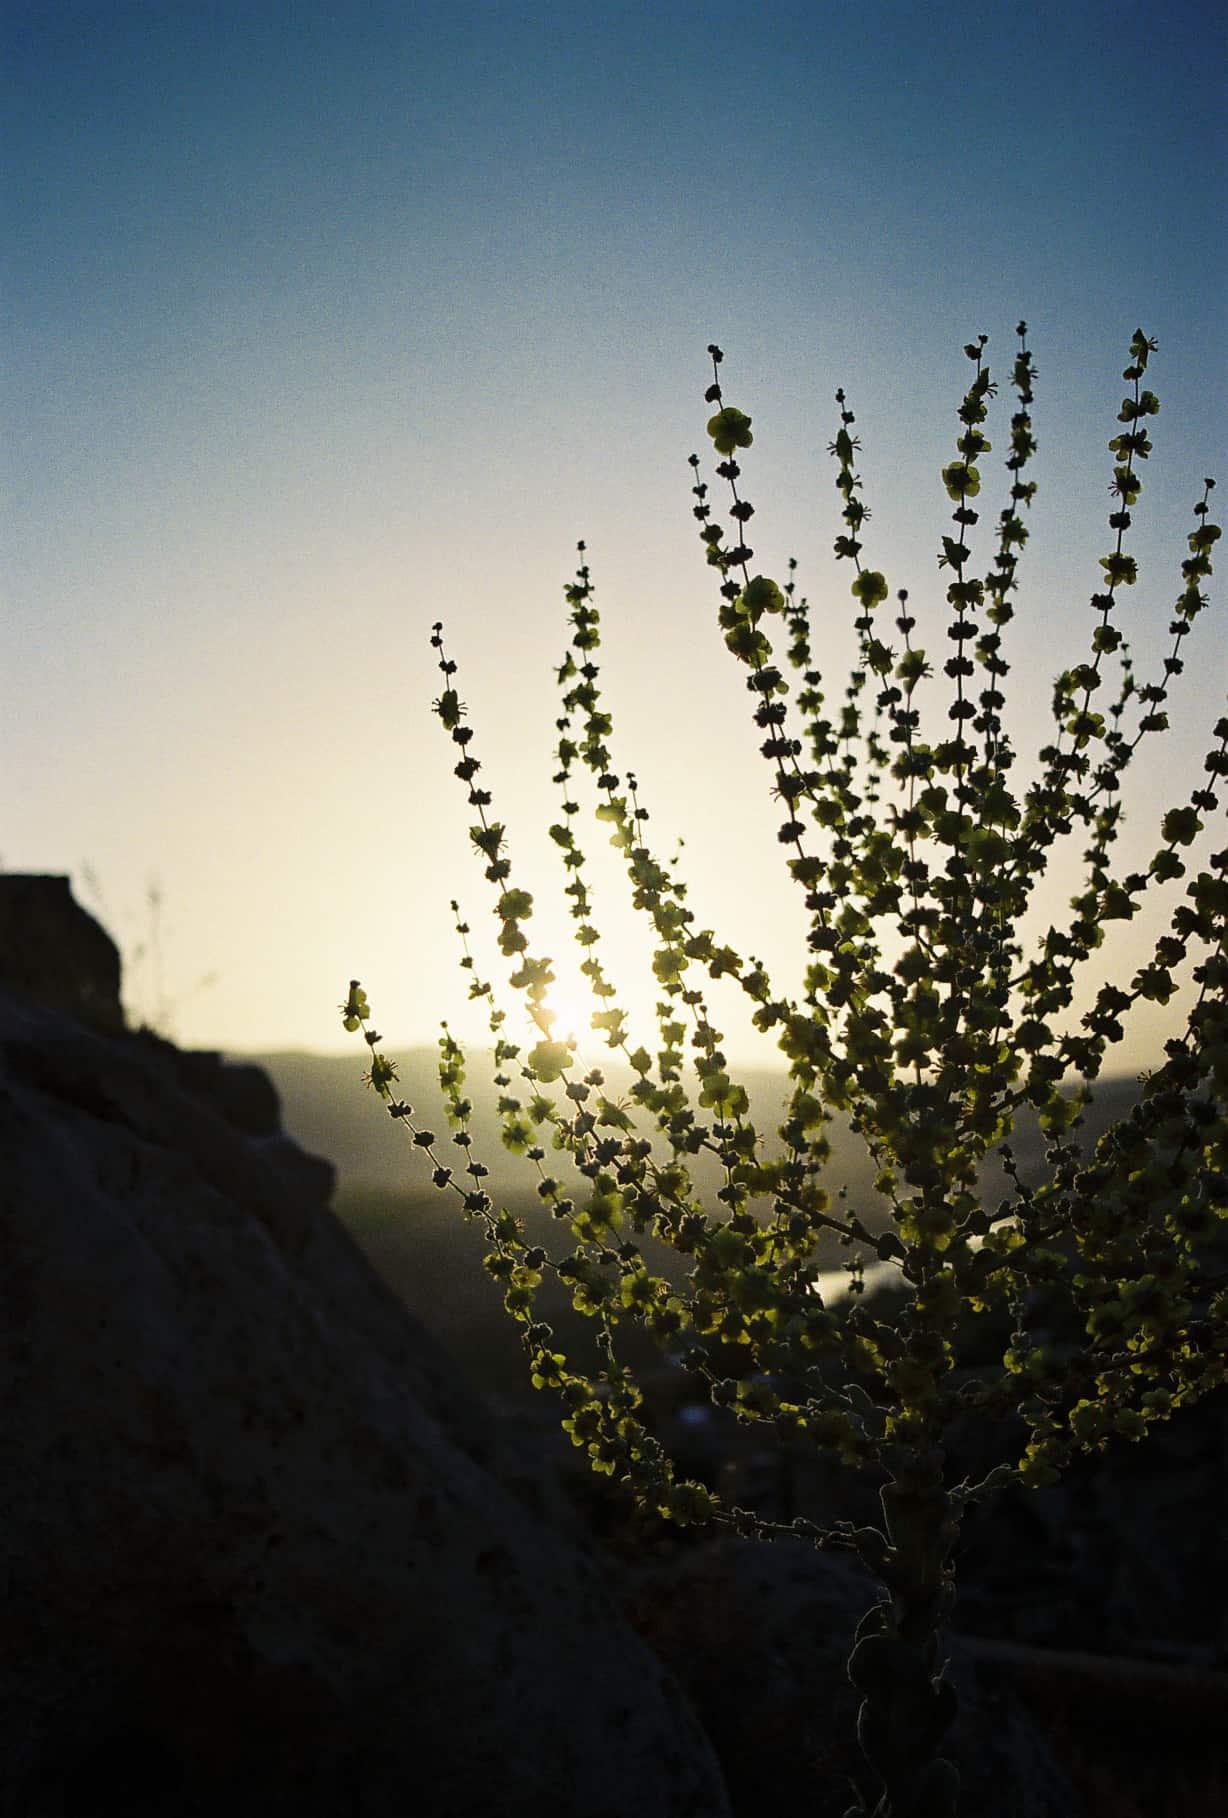 Strange Plants at Sunrise